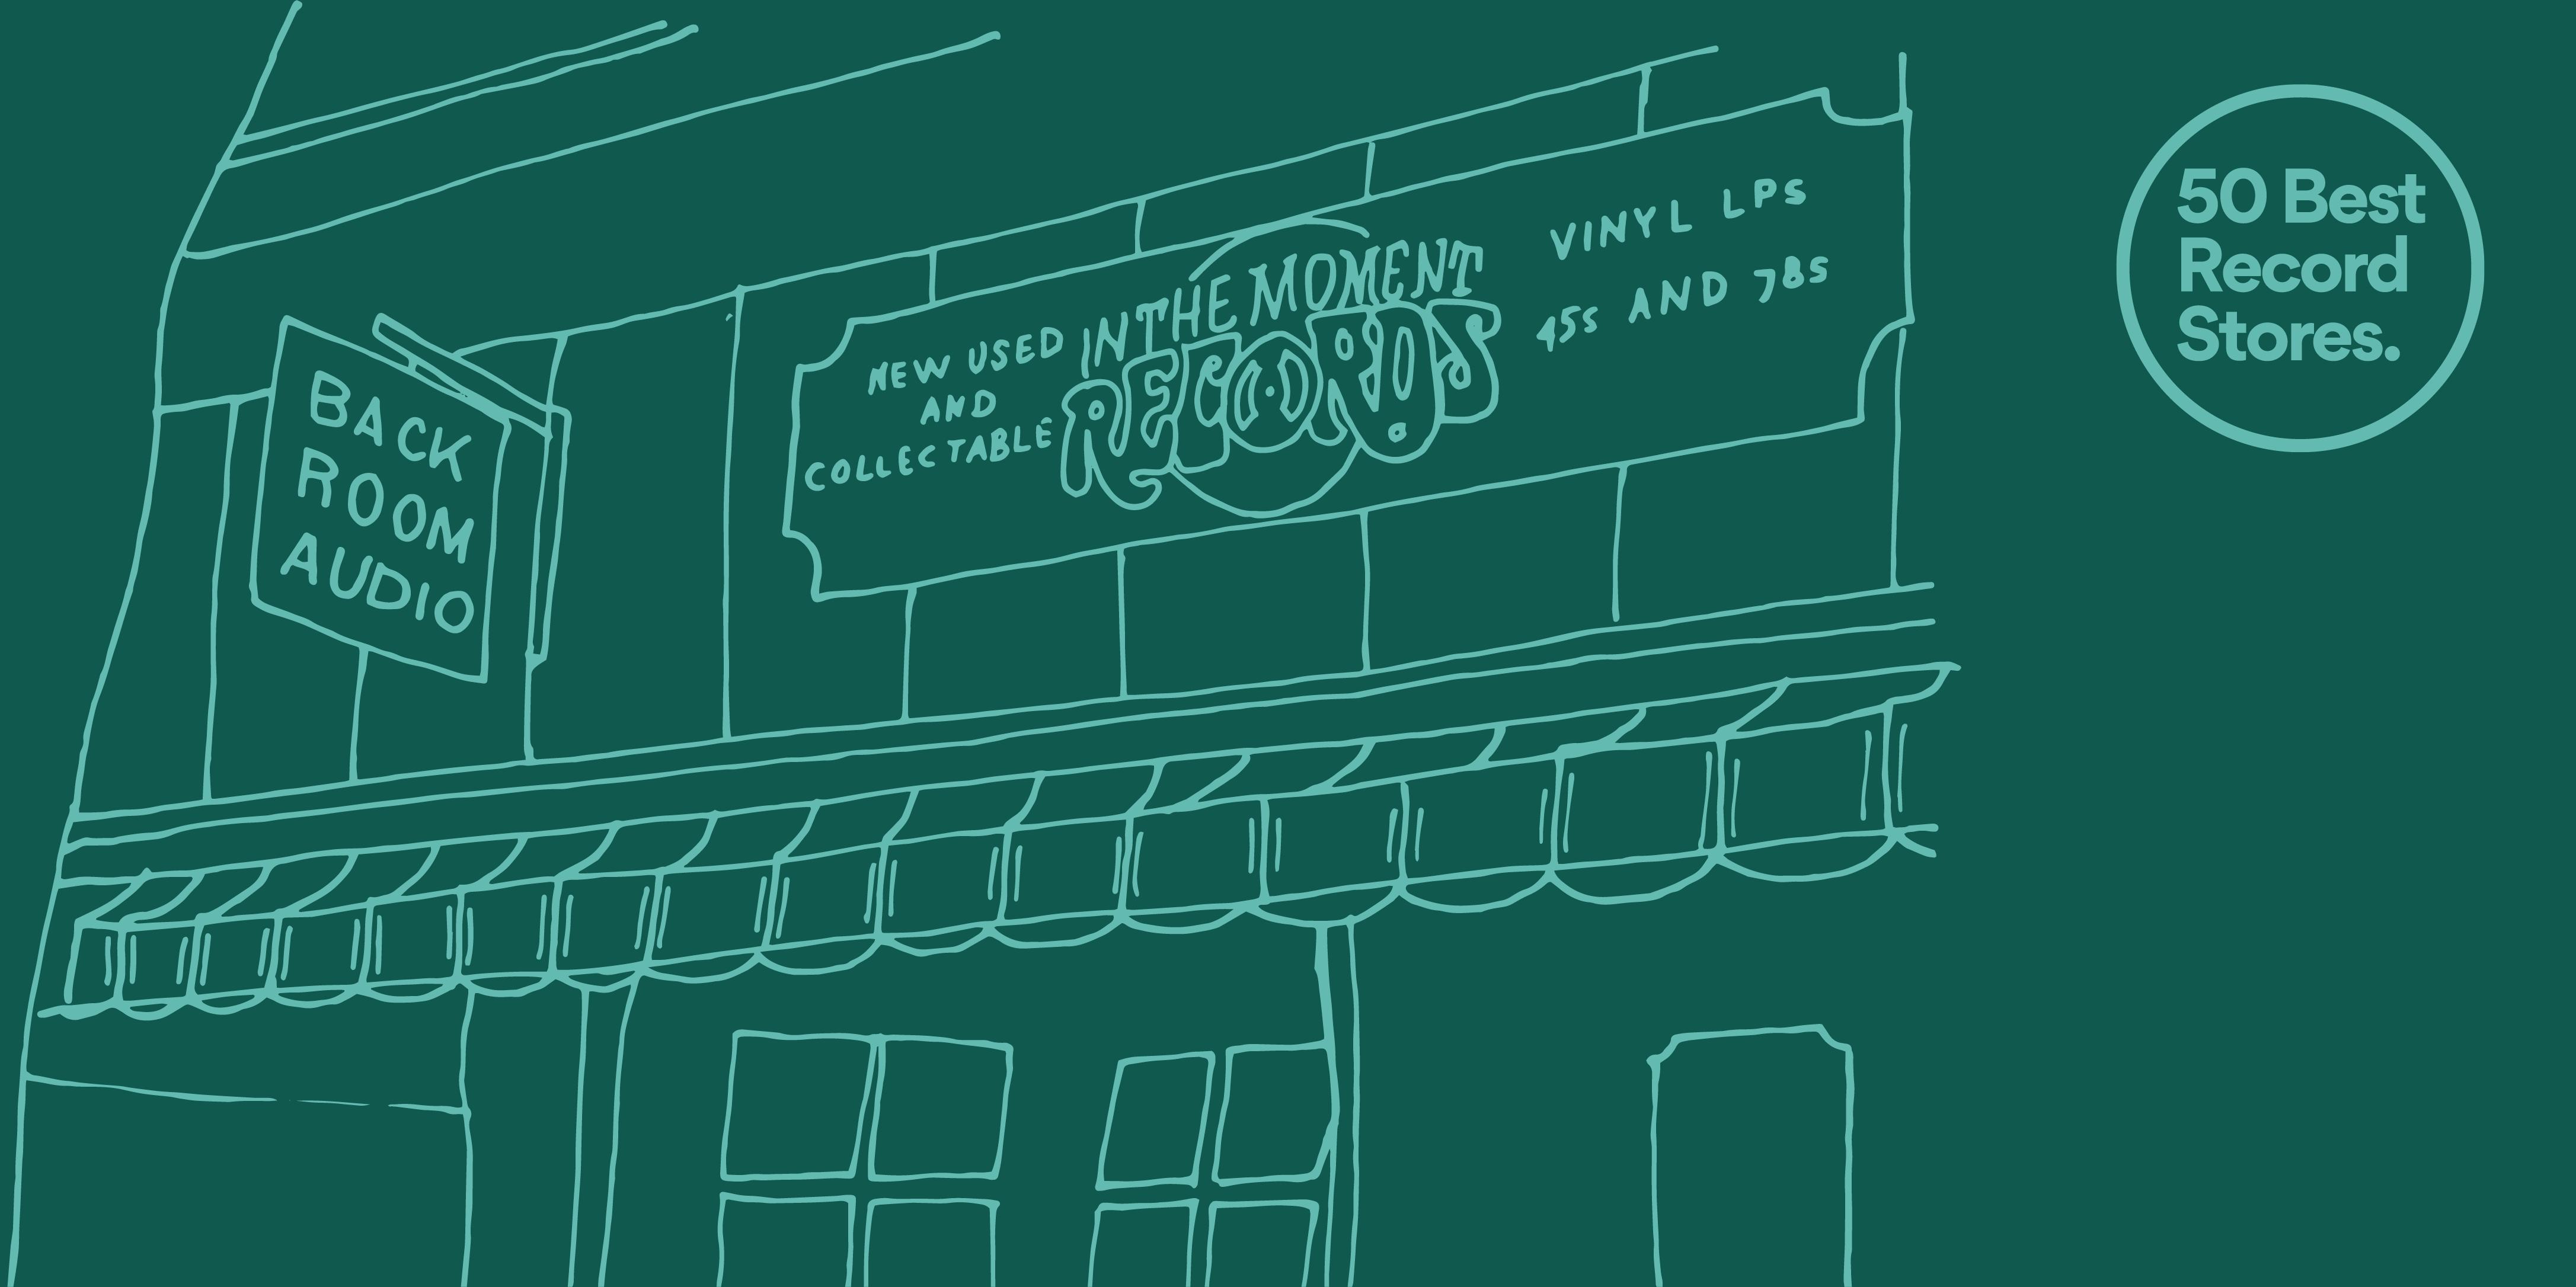 Vermont Record Store